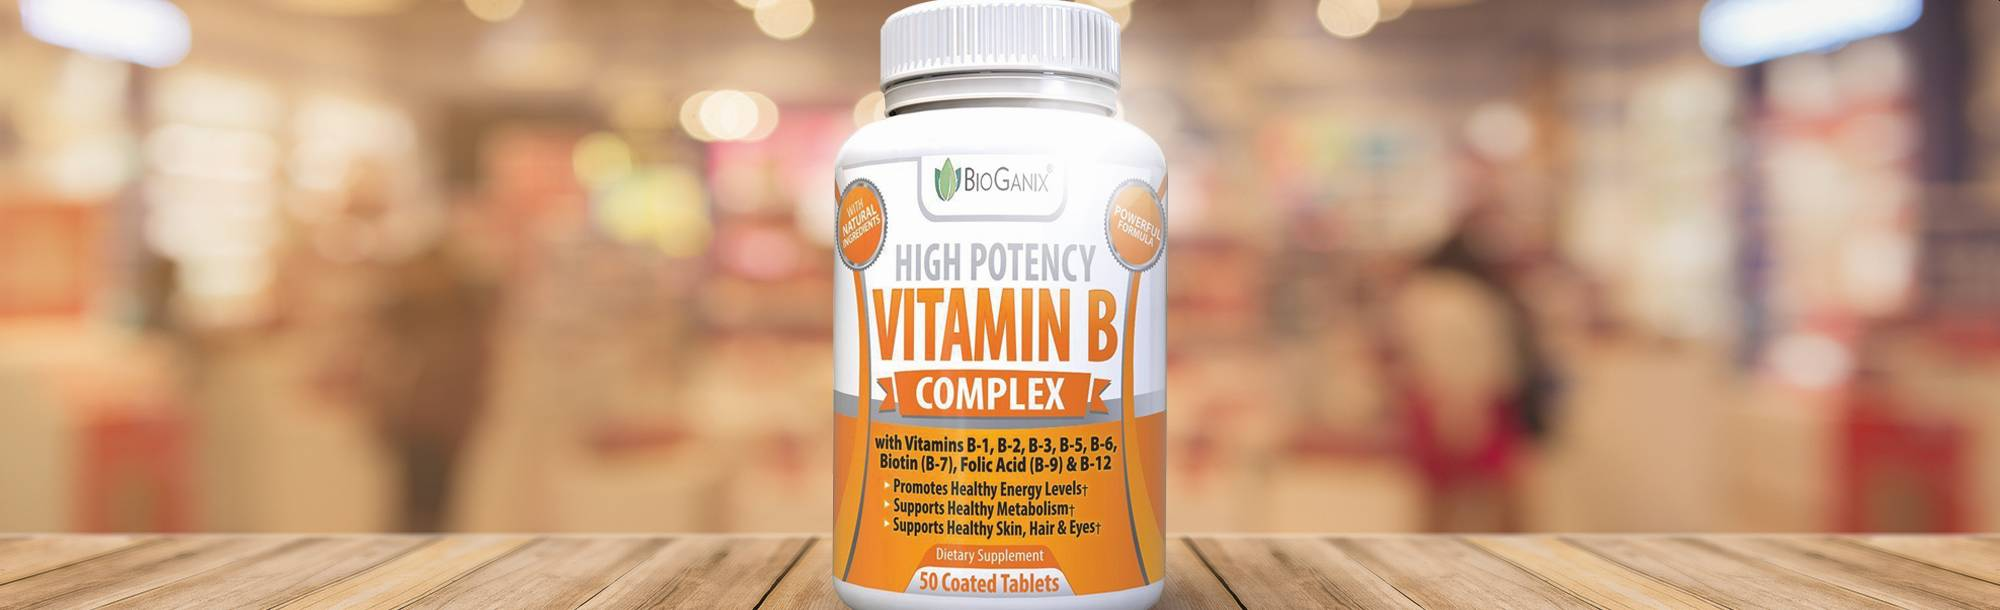 Bioganix Vitamin B Complex Review